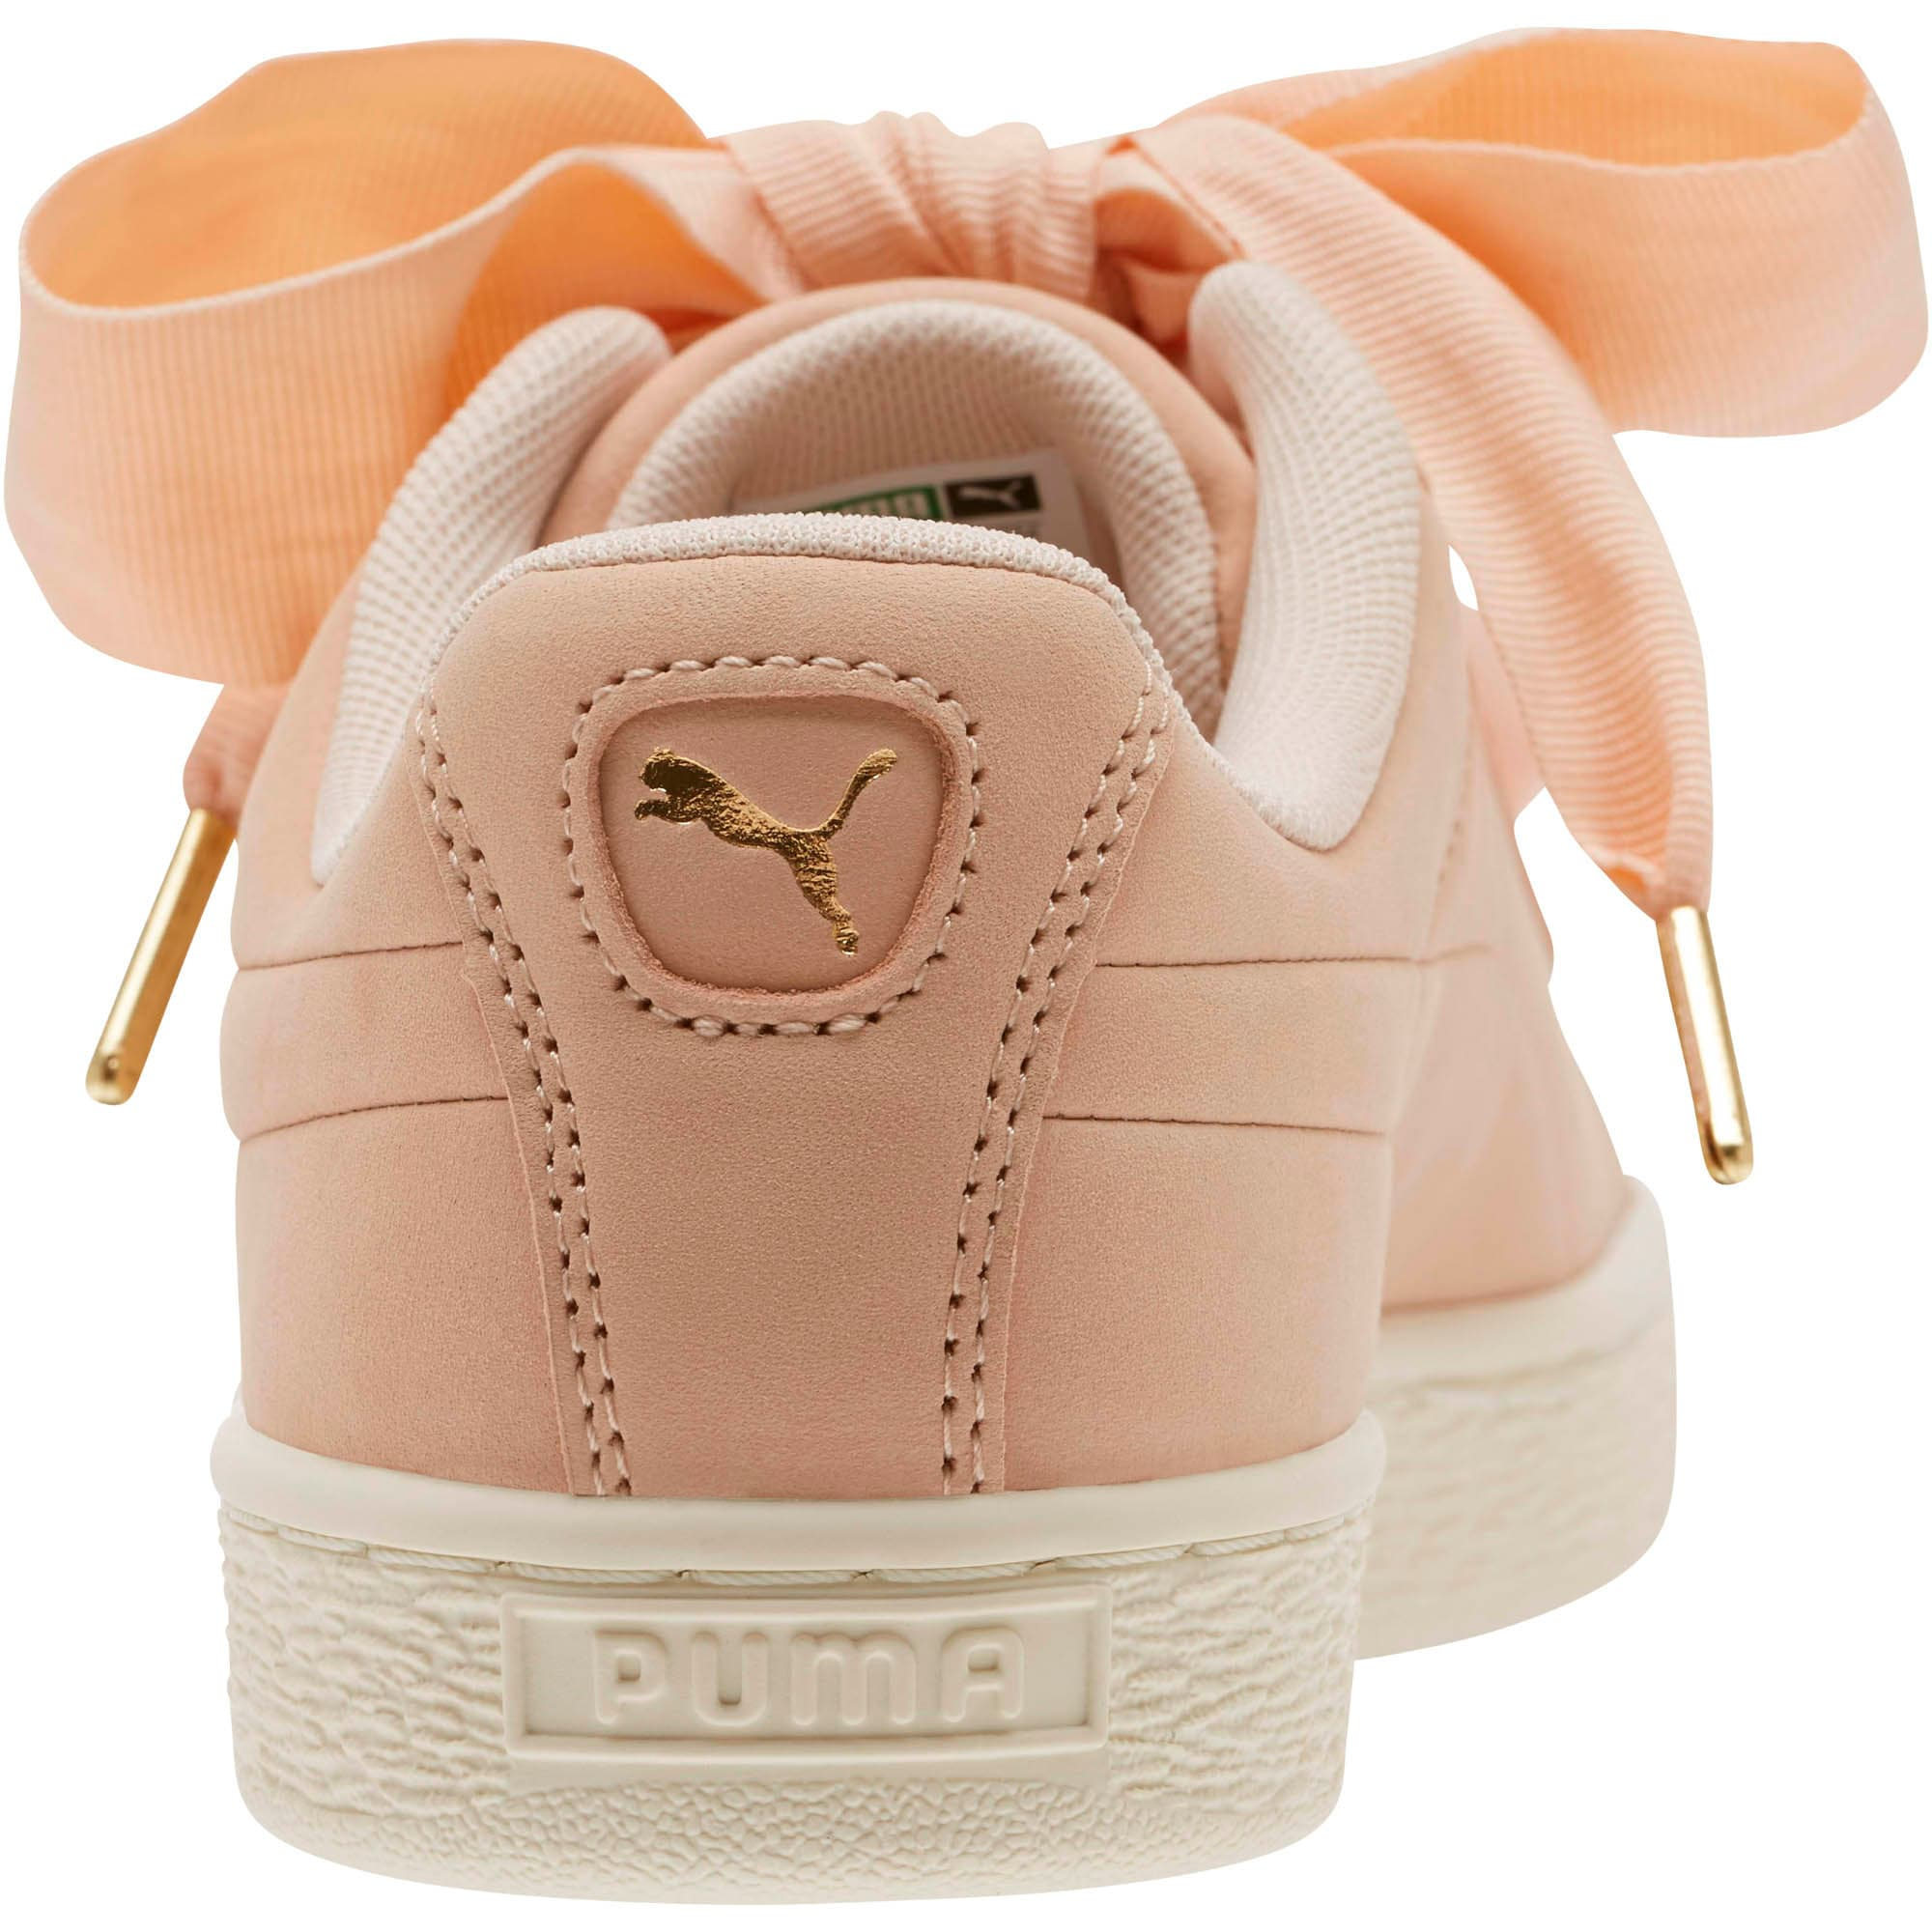 Thumbnail 3 of Basket Heart Soft Women's Sneakers, Cream Tan-Marshmallow, medium